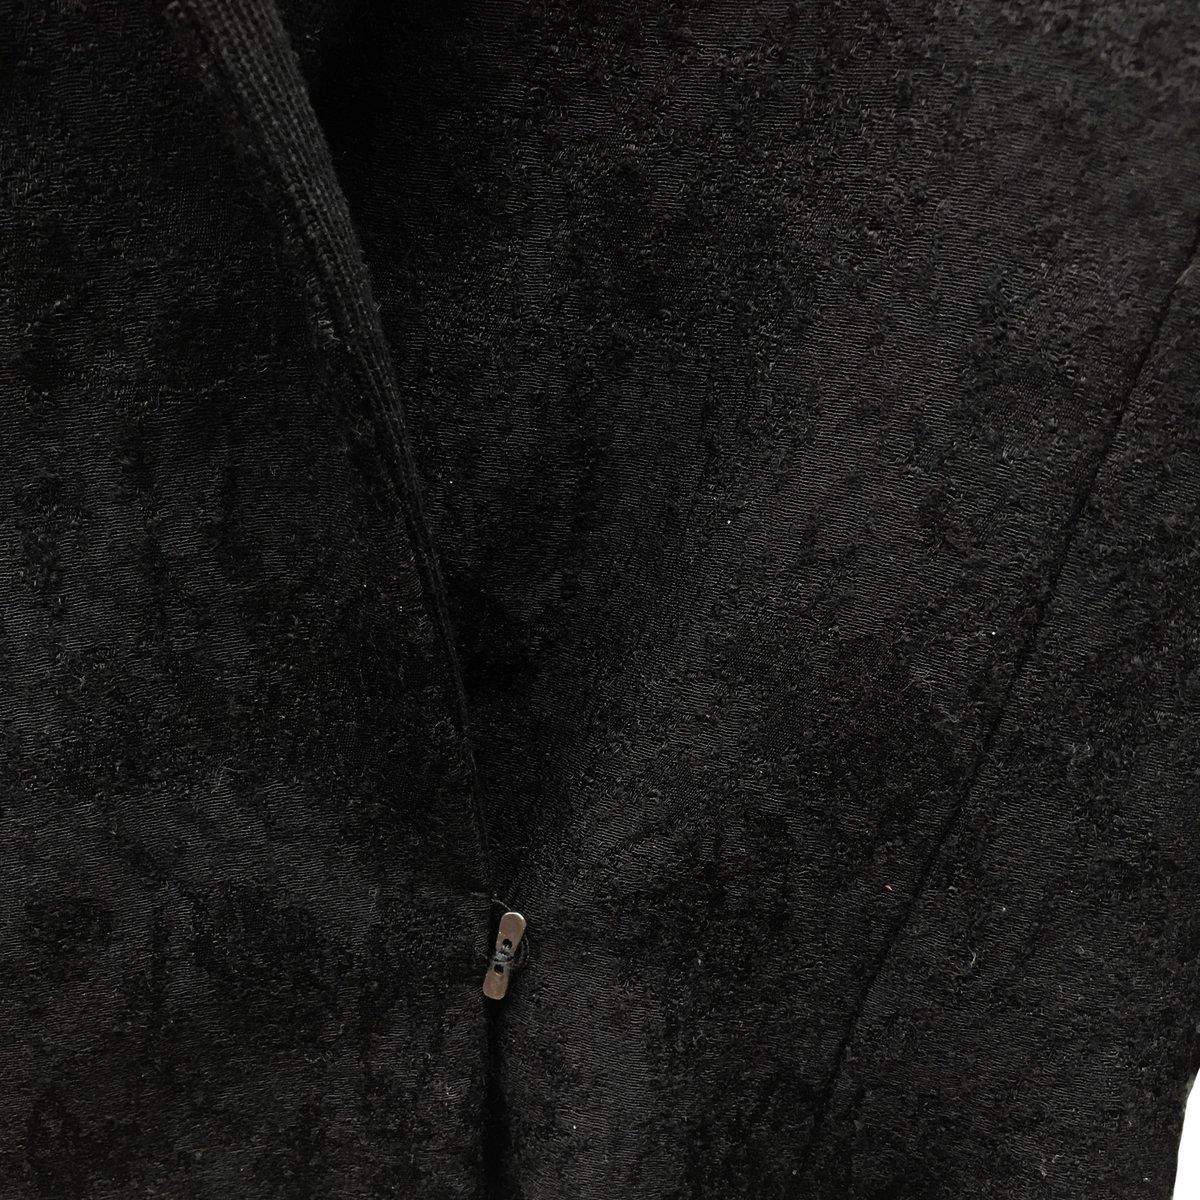 Maurizio Amadei Brocade Blazer detail2.jpg